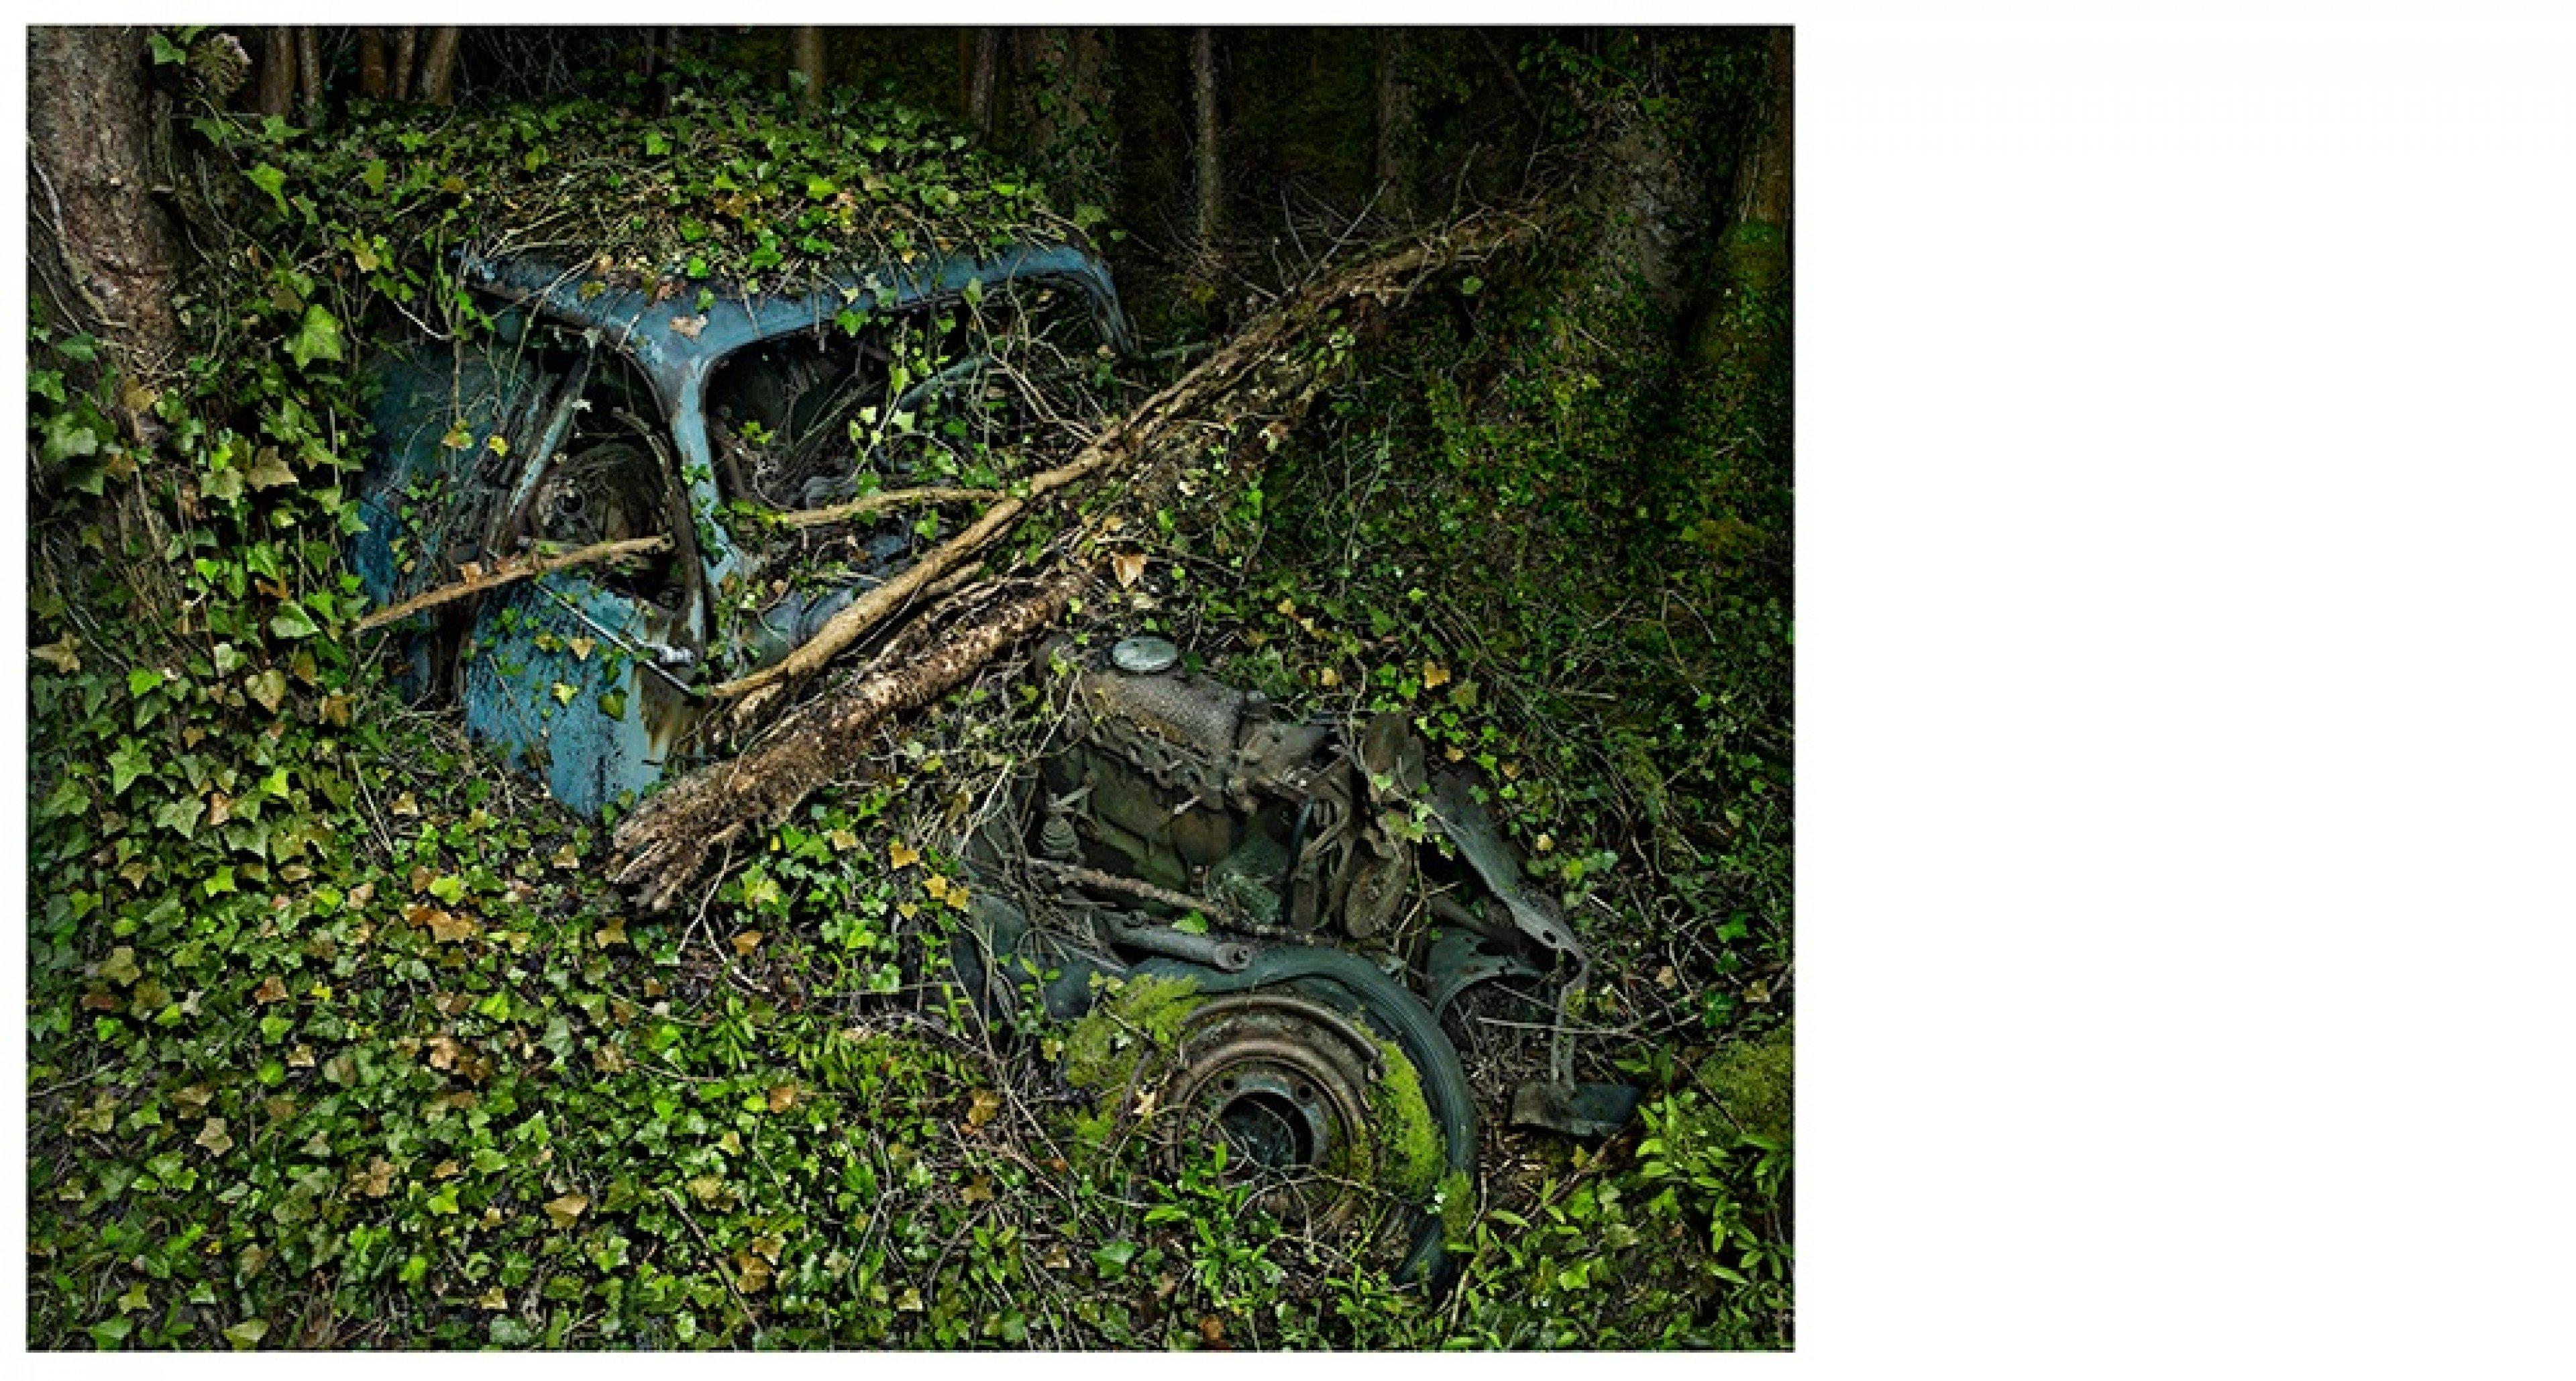 Peter Lippmann, Citroën Traction 7, 2012 From Paradise Parking series C-print, 75 × 100 cm Collection of the artist © Peter Lippmann